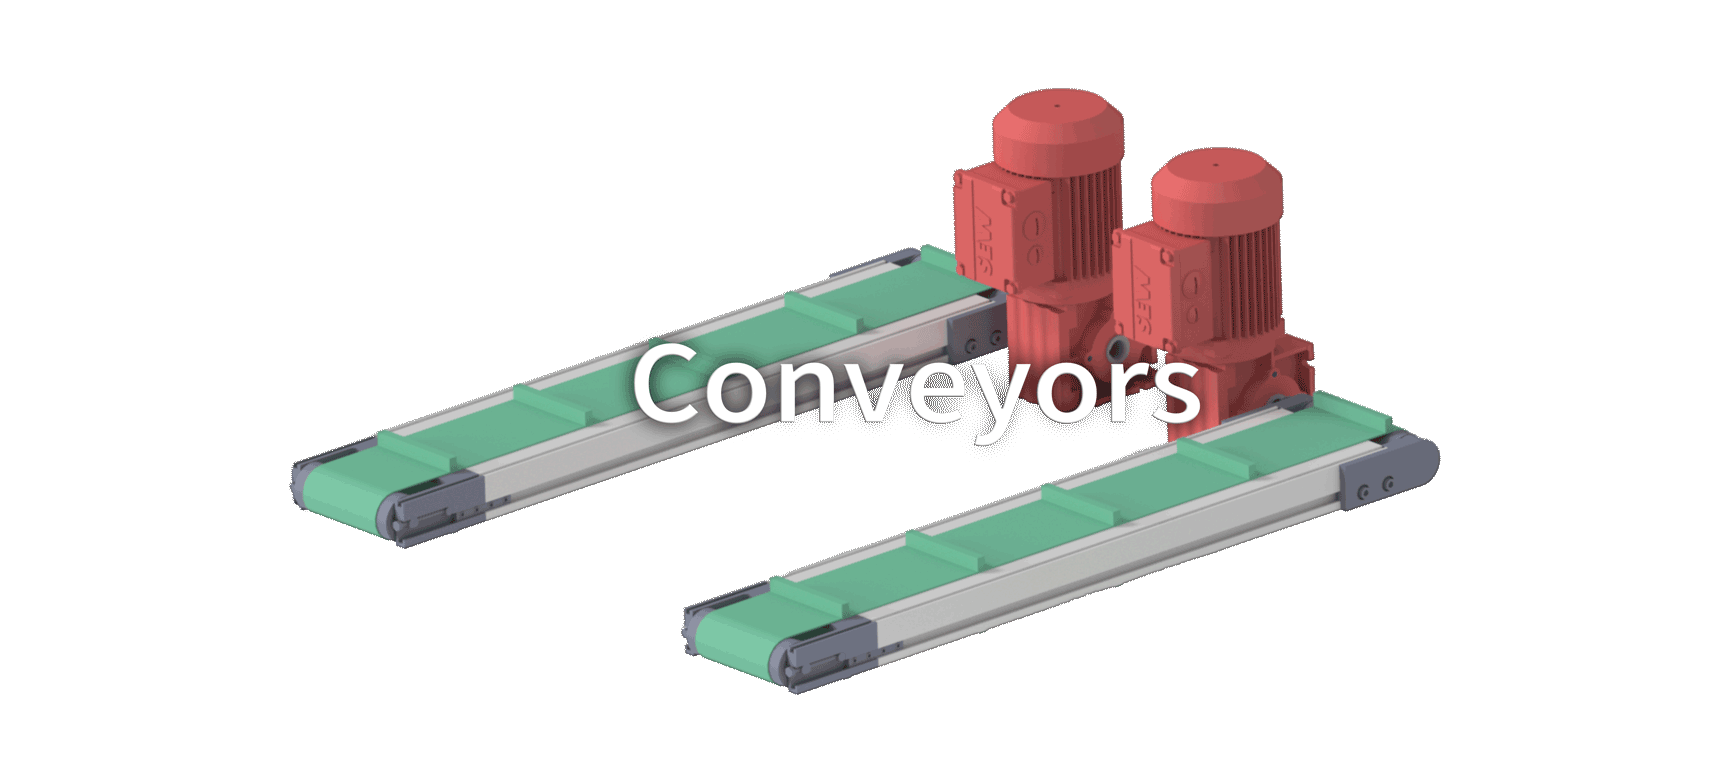 Conveyors-Smac-SRL